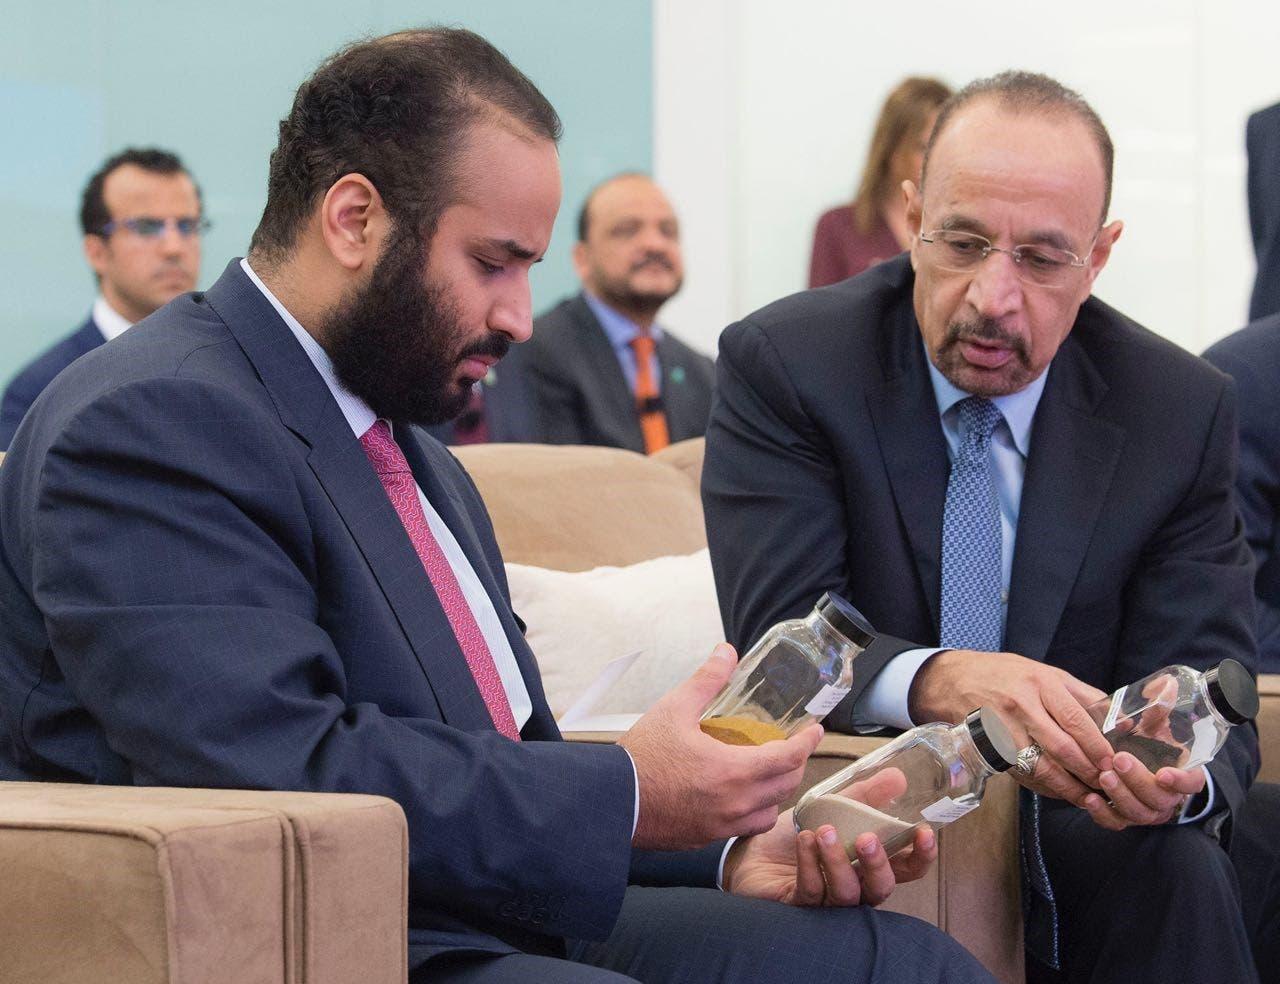 محمد بن سلمان أرامكو